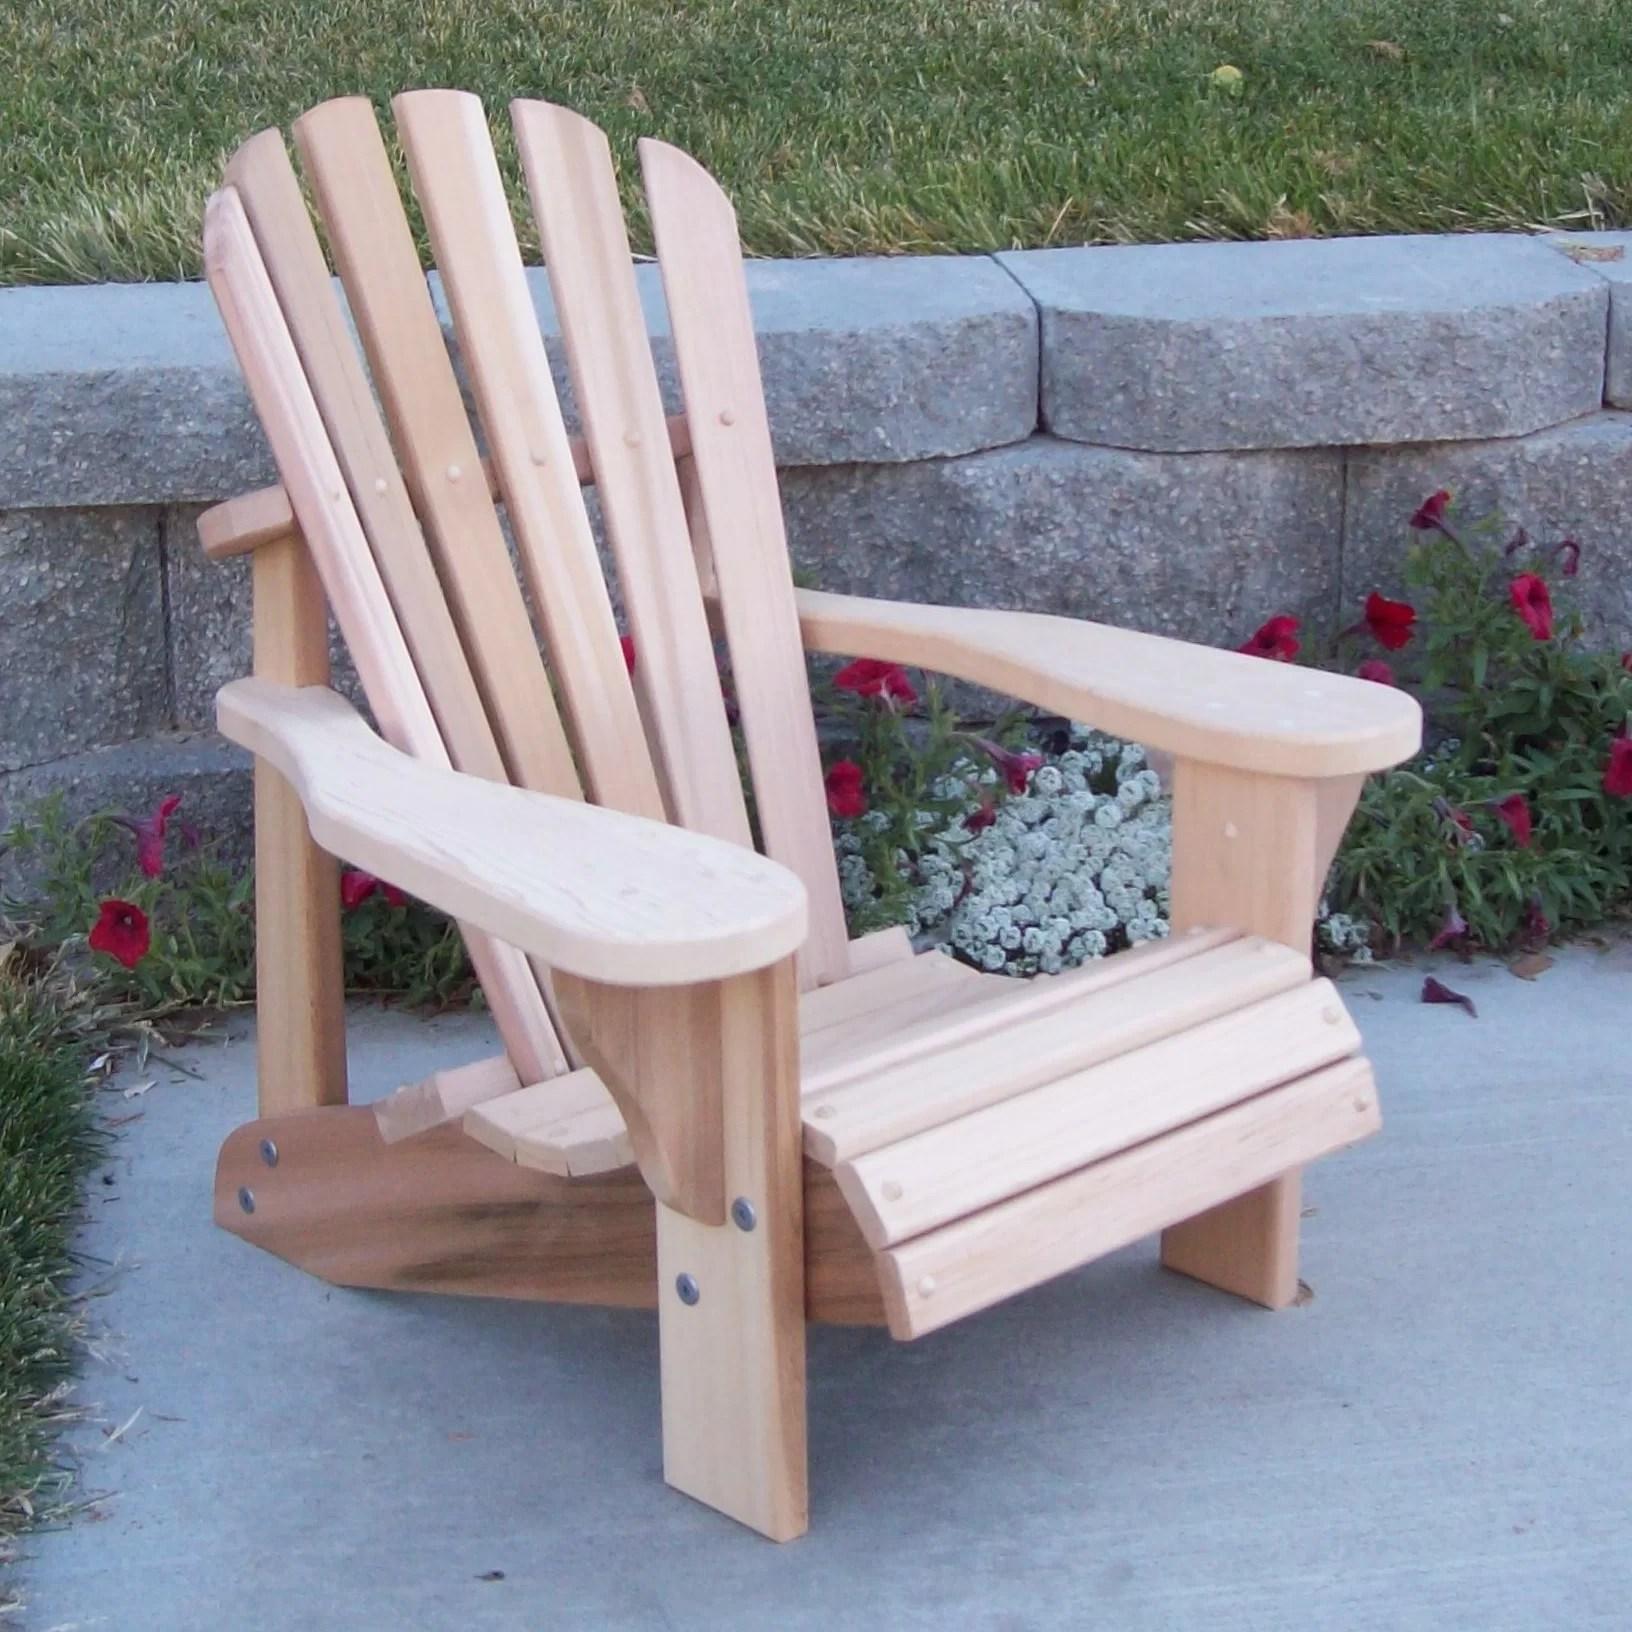 WoodCountry TL Childs Adirondack Chair  Wayfair